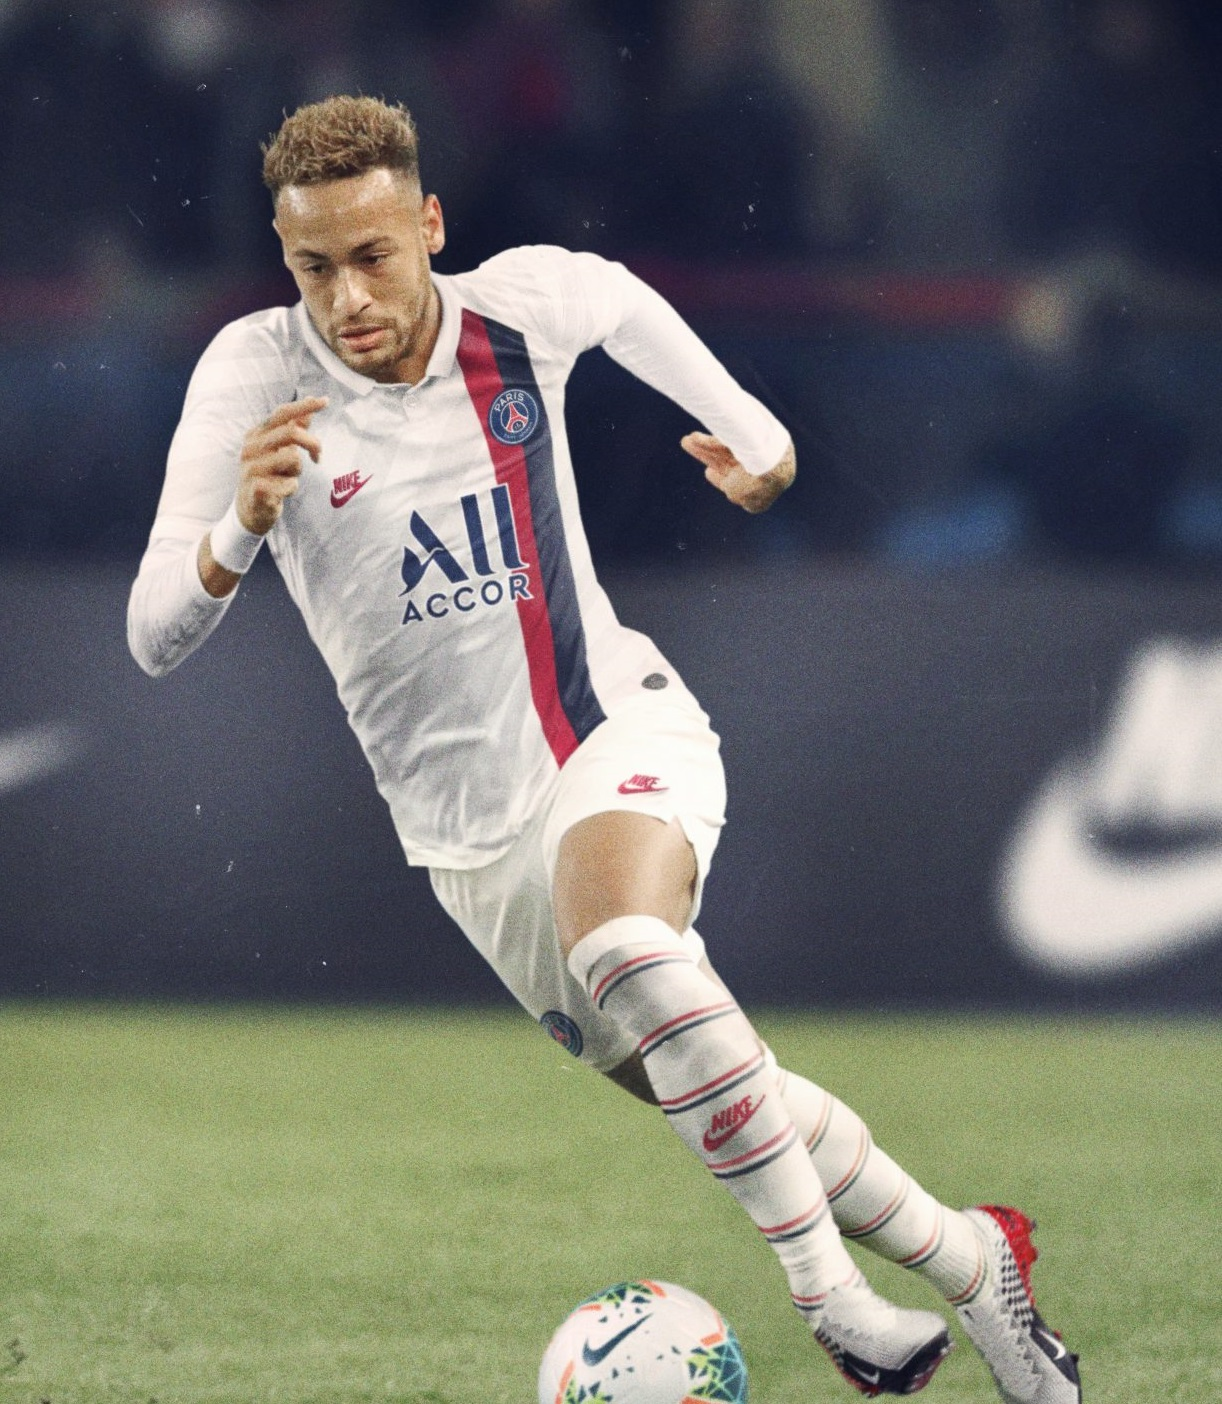 Neymar maillot third paris 2019 2020 Nike